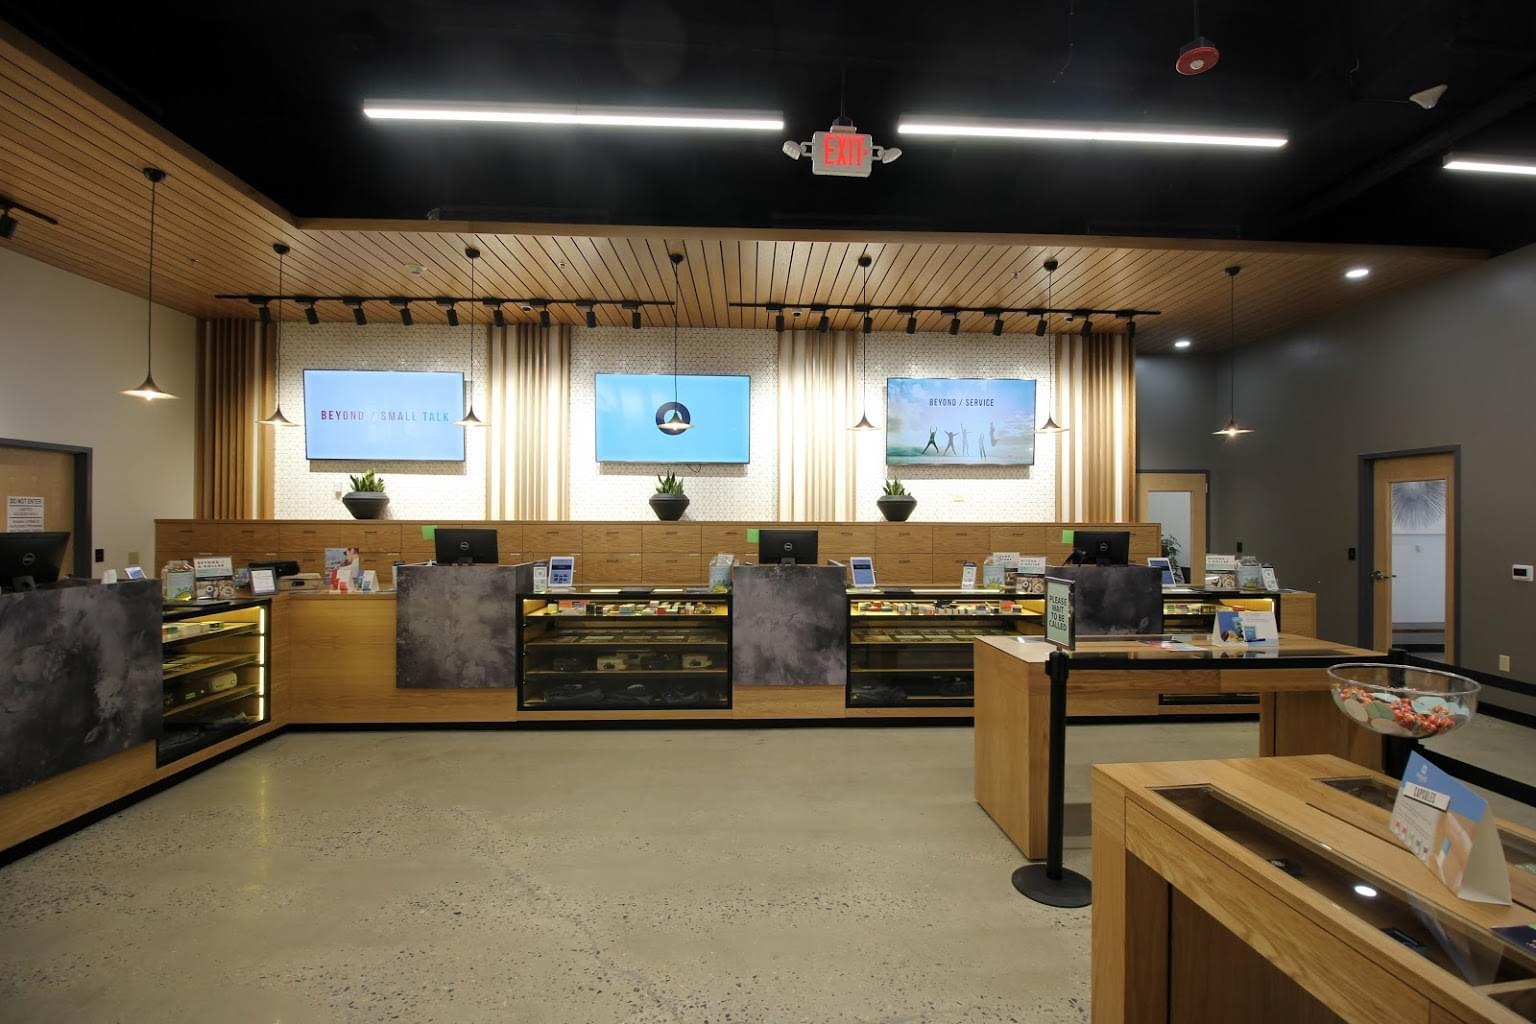 BEYOND HELLO medical marijuana dispensary in Philadelphia, PA counters